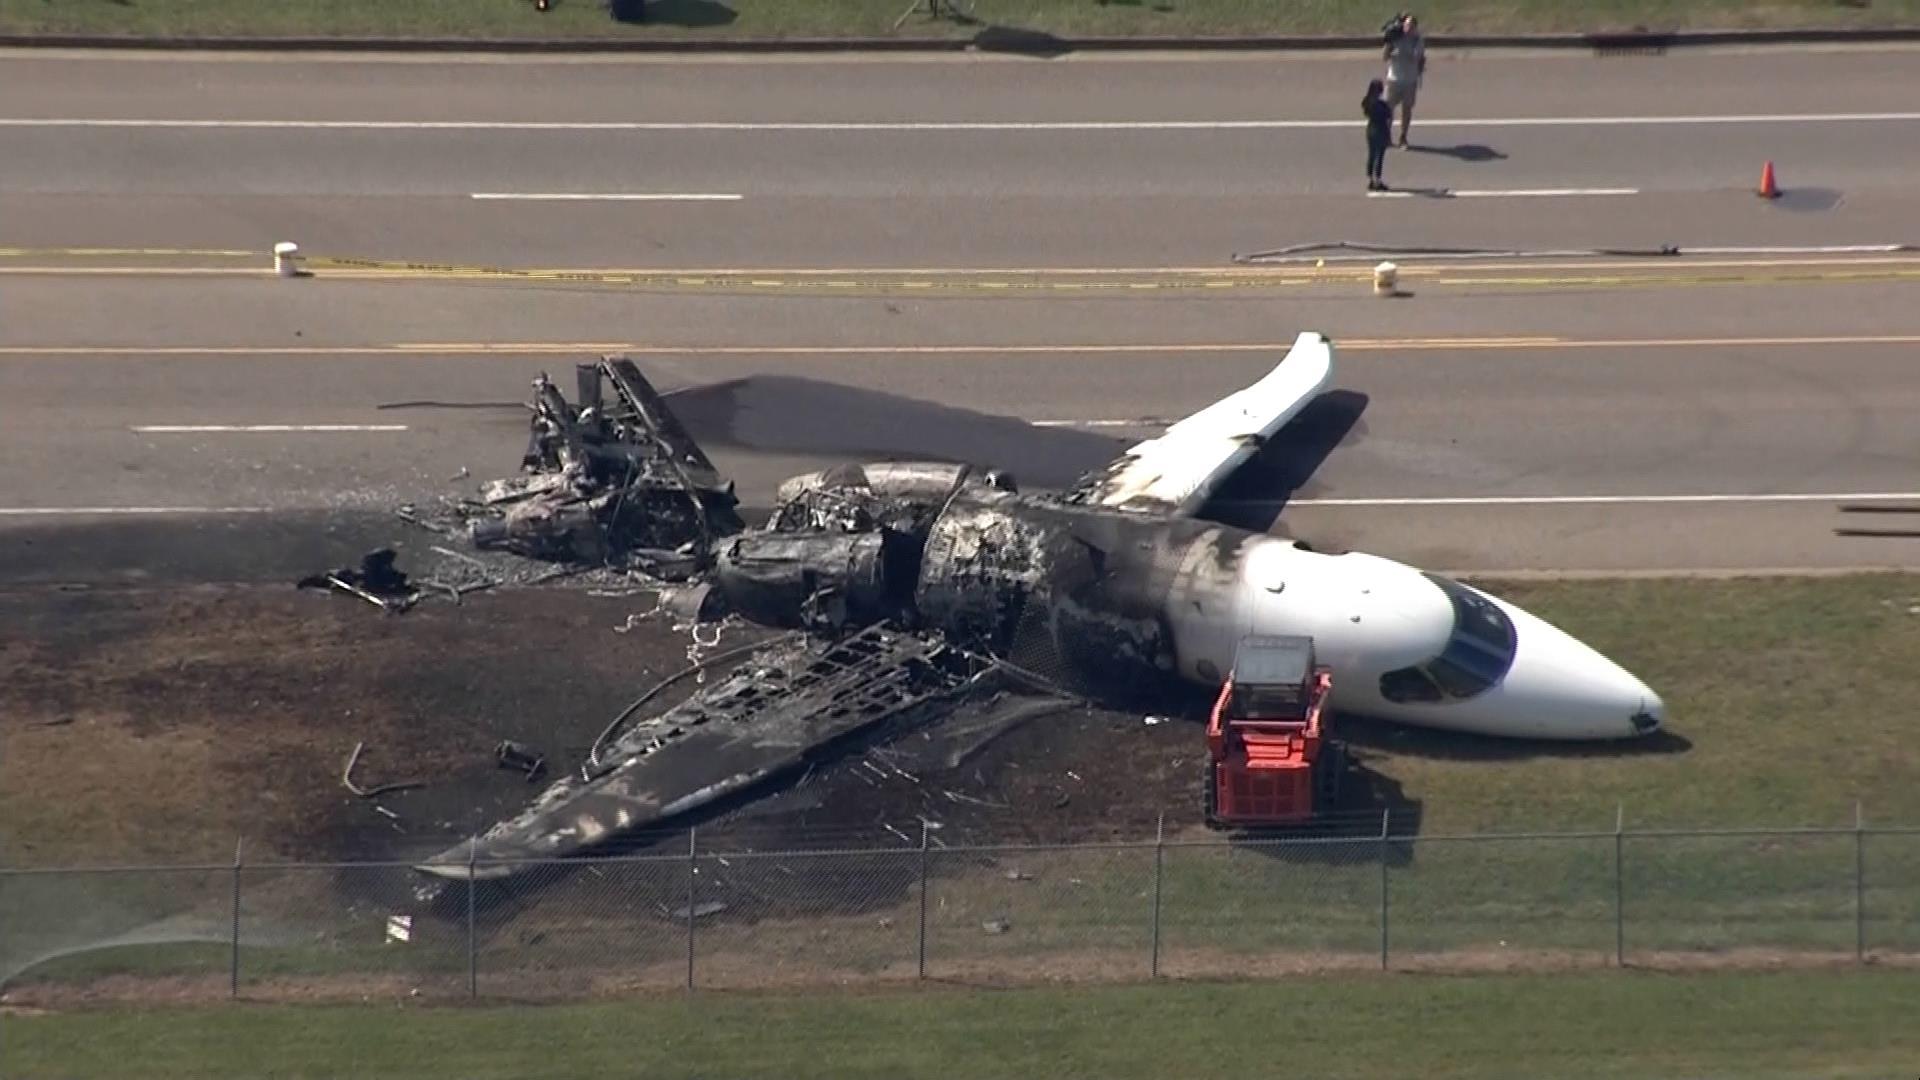 Dale Earnhardt Jr.'s plane bounced multiple times, went off runway during crash